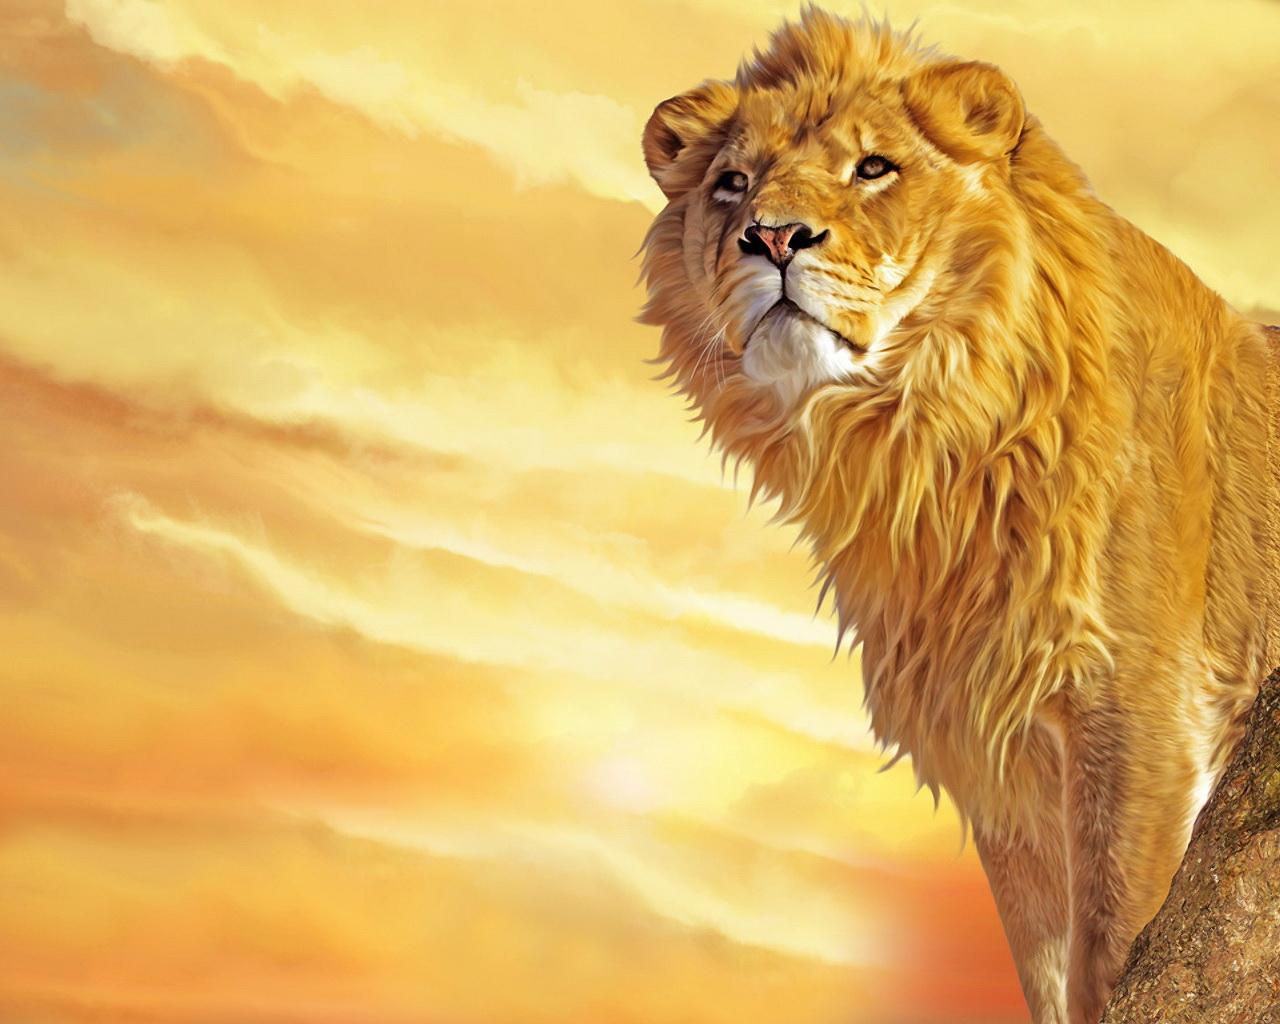 http://3.bp.blogspot.com/-zP_0ia2r0qc/T3mvdu4mb7I/AAAAAAAABKA/7RVEKu3SdJA/s1600/Lion_king_wallpaper.jpg